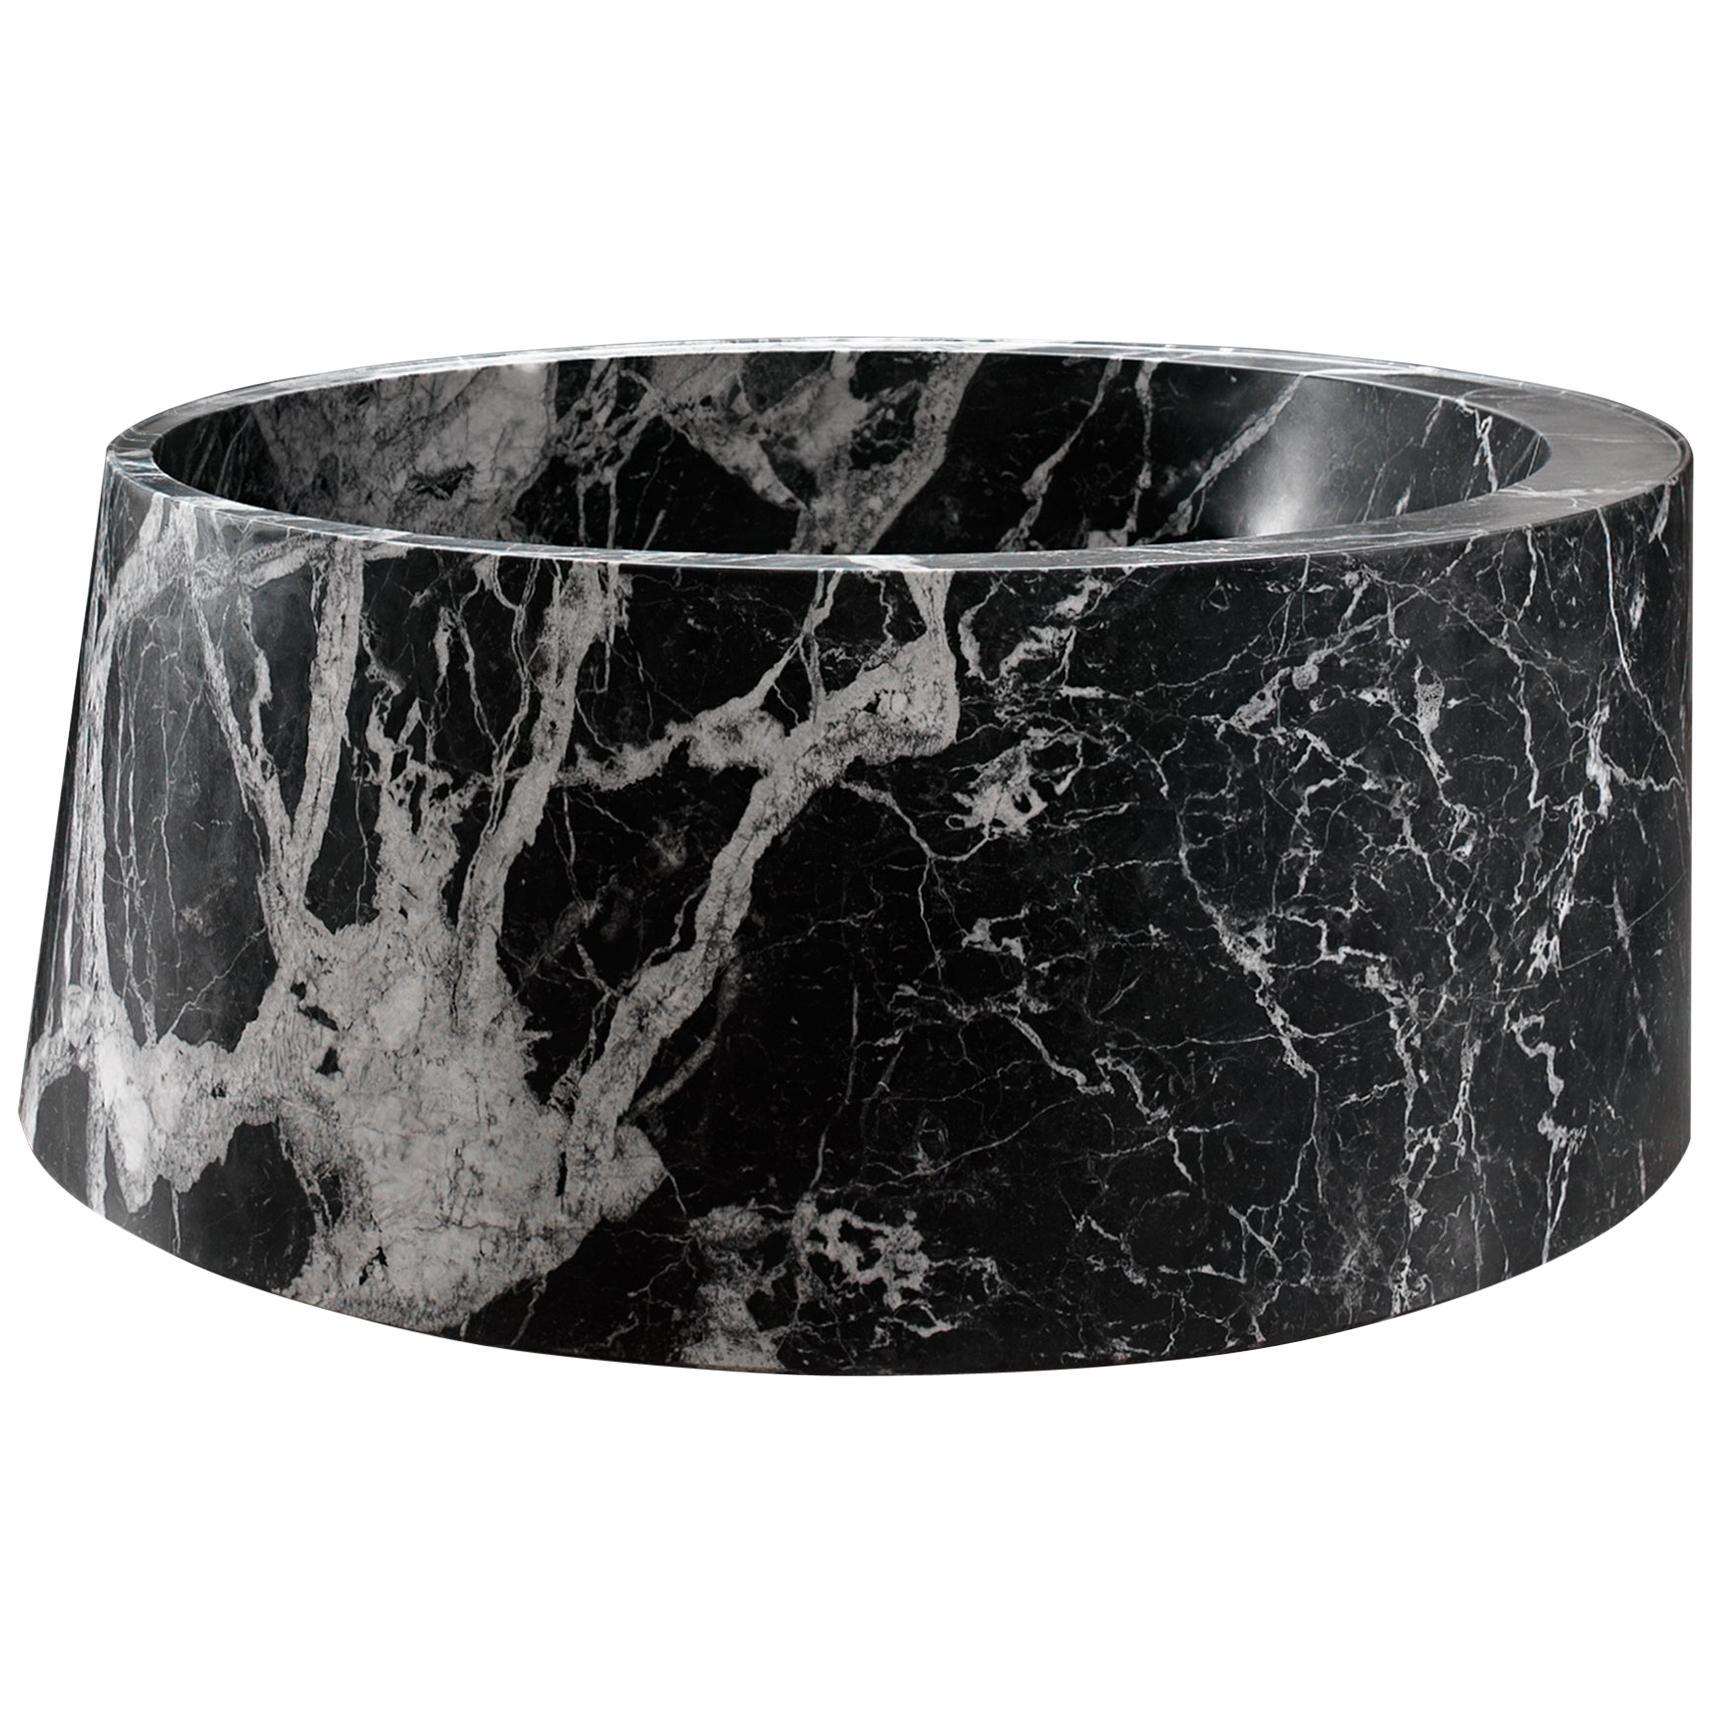 Desco Circle Bathtub Made of Marble Customizable